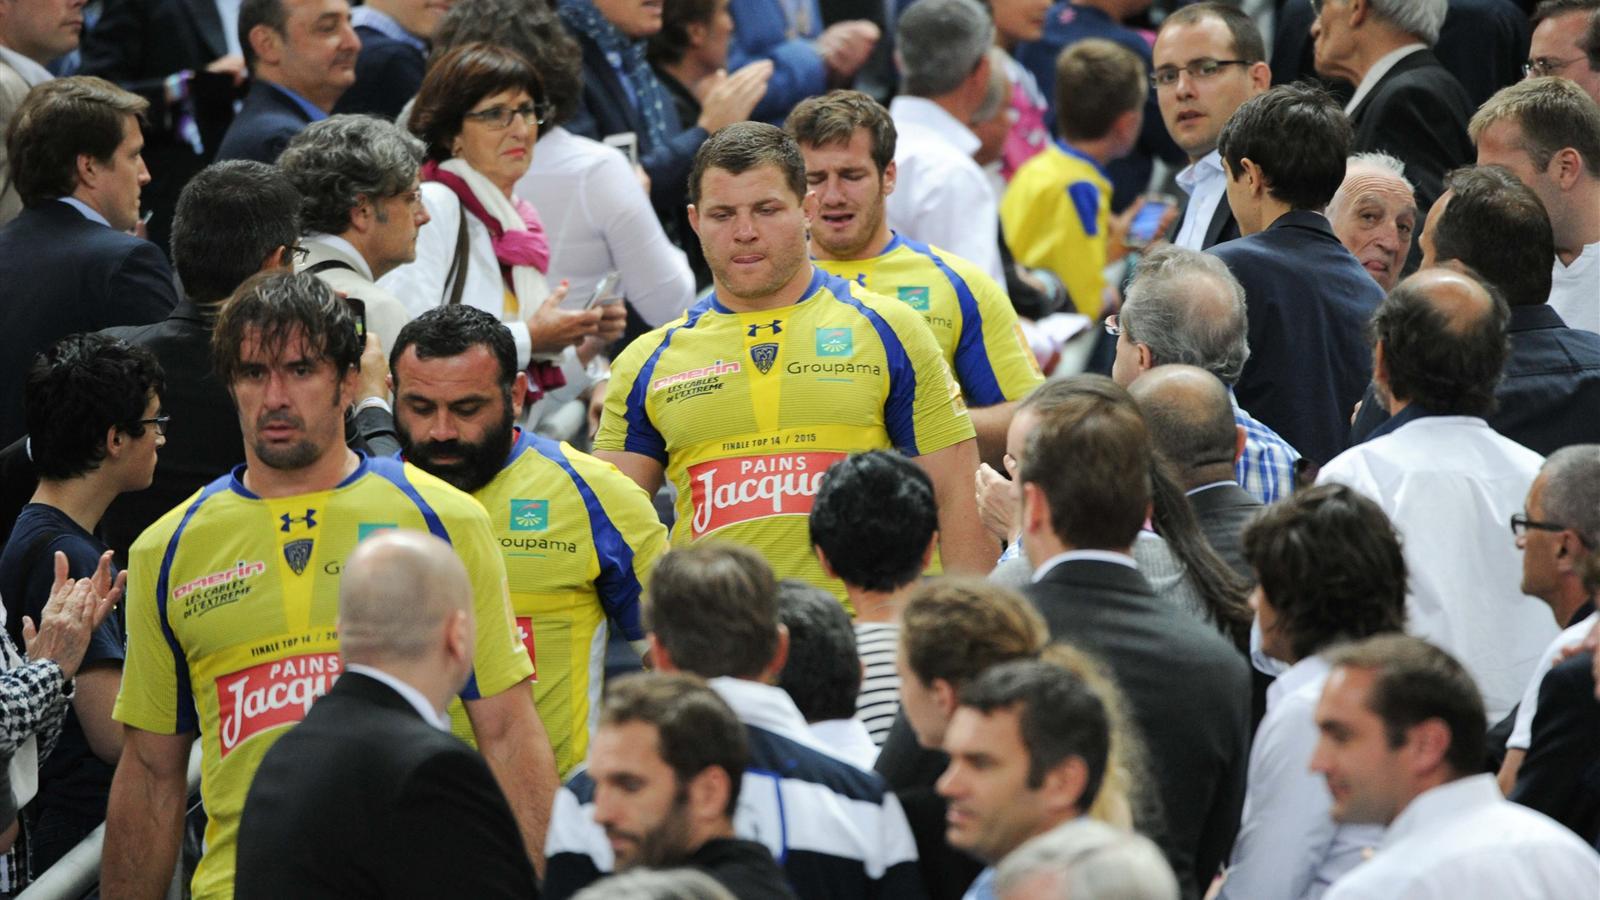 Pierre, Zirakashvili, Kayser et Lopez (Clermont) - 13 juin 2015